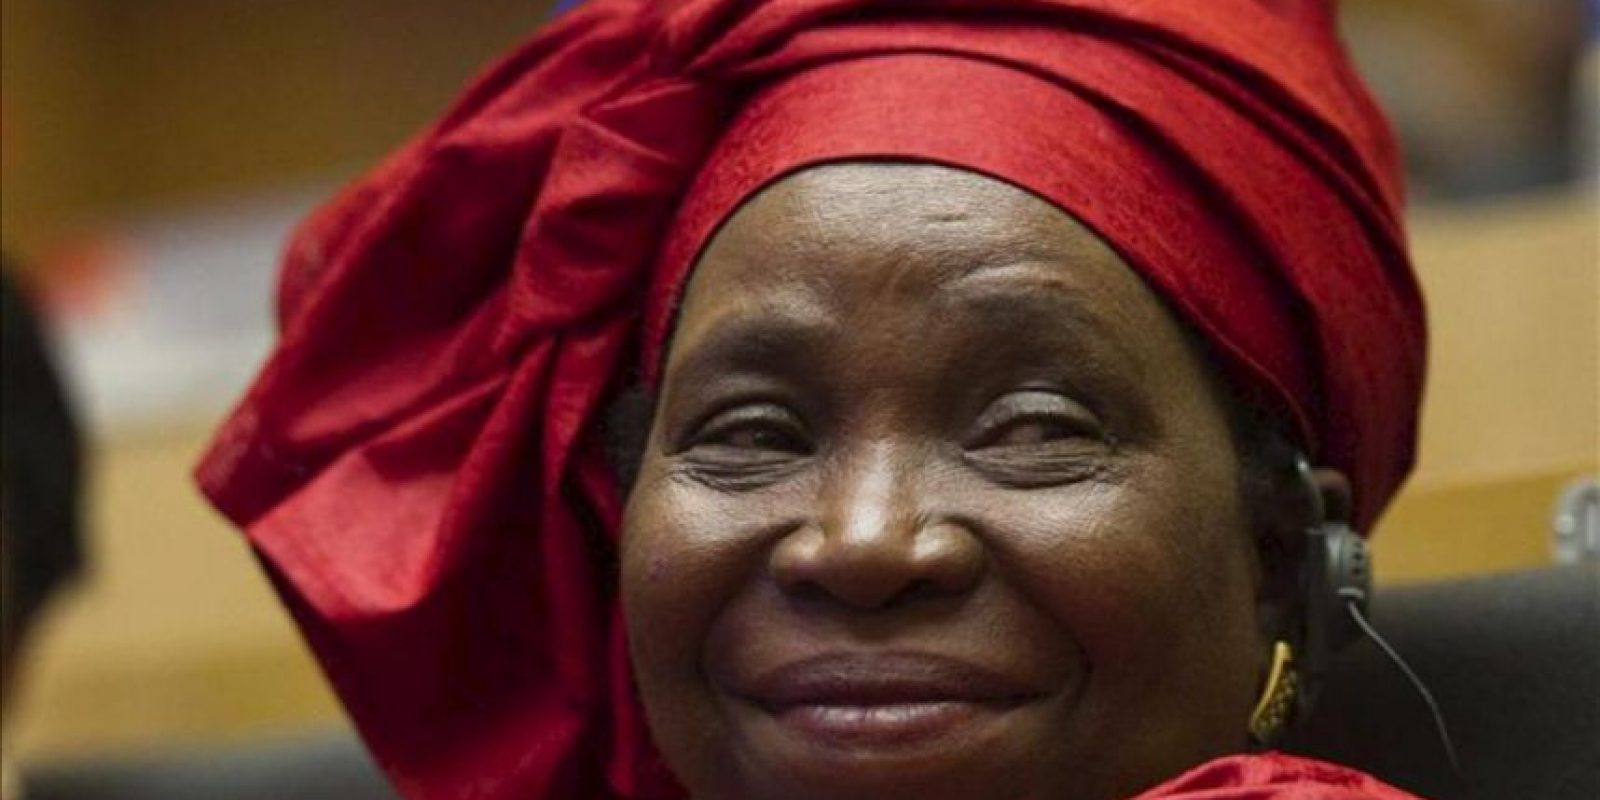 La presidenta de la Comisión de la Unión Africana (UA), Nkosazana Dlamini-Zuma. EFE/Archivo